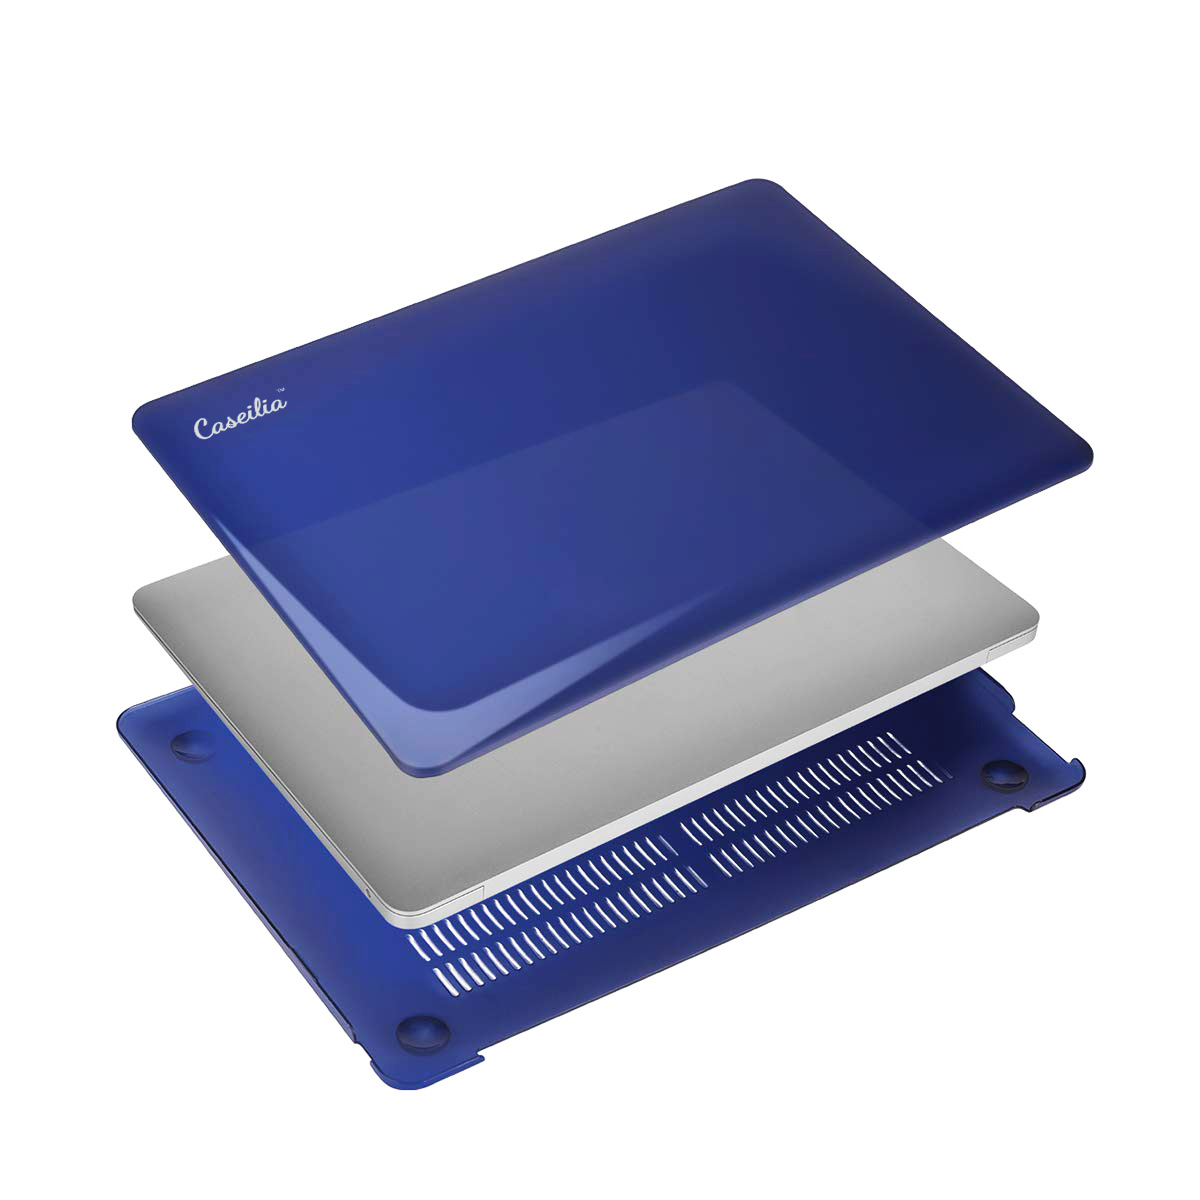 Caseilia_MacBook_CRYSTAL (6)